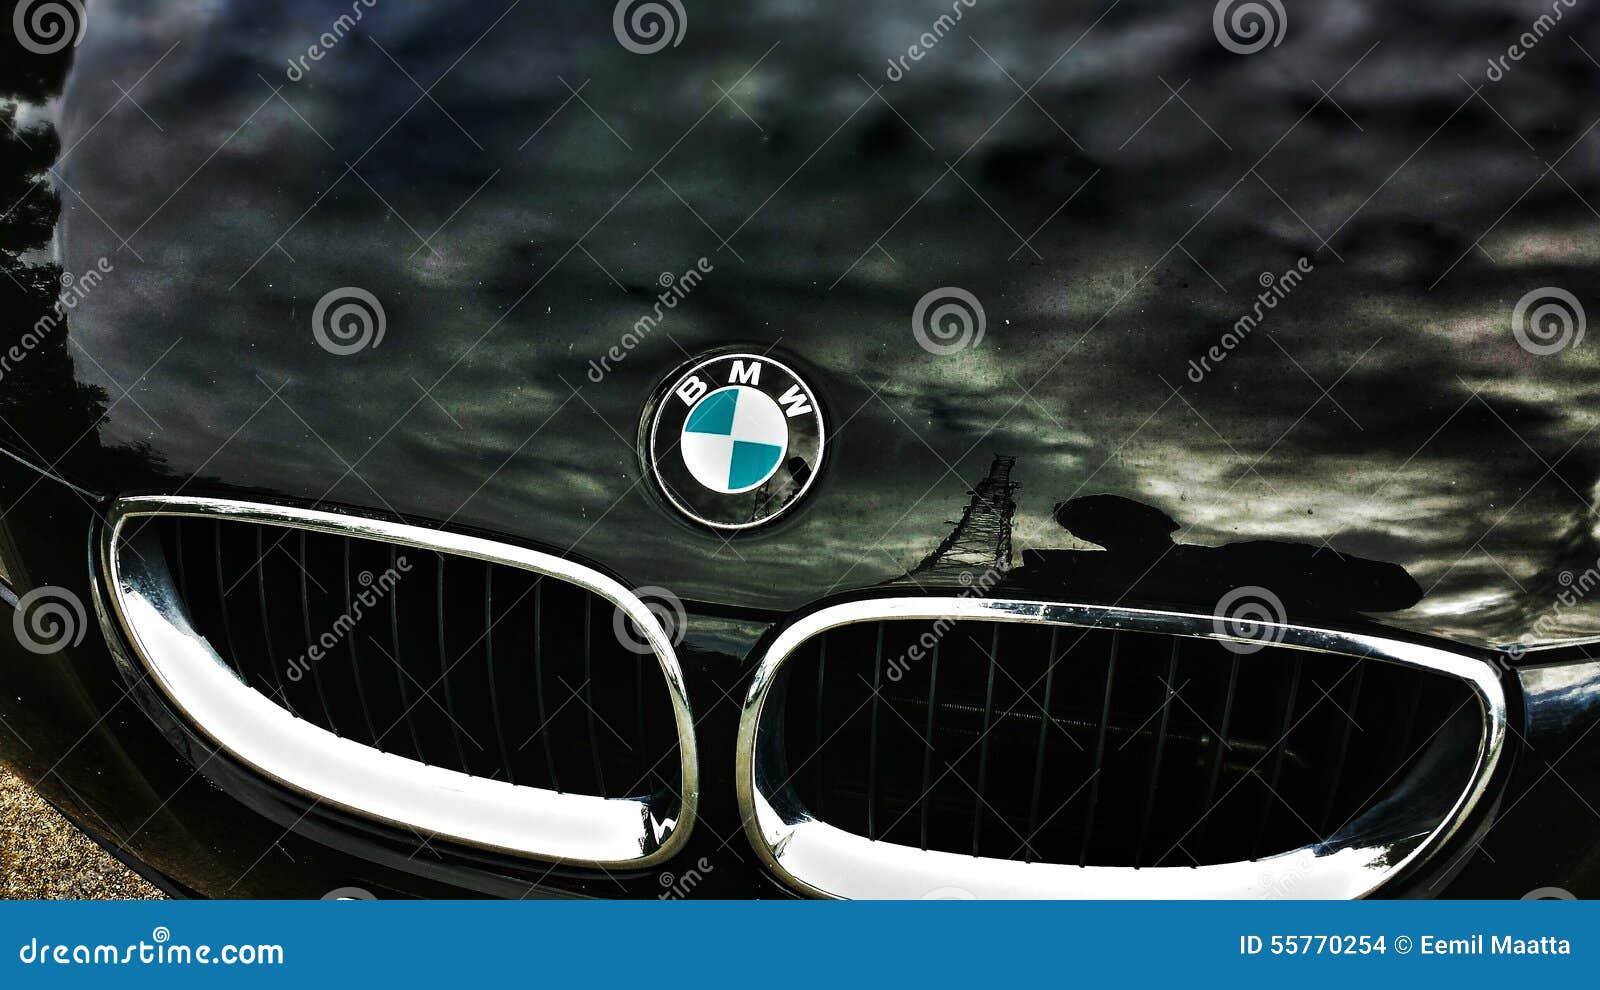 Black Bmw Car Editorial Stock Image Image Of Dark Black 55770254